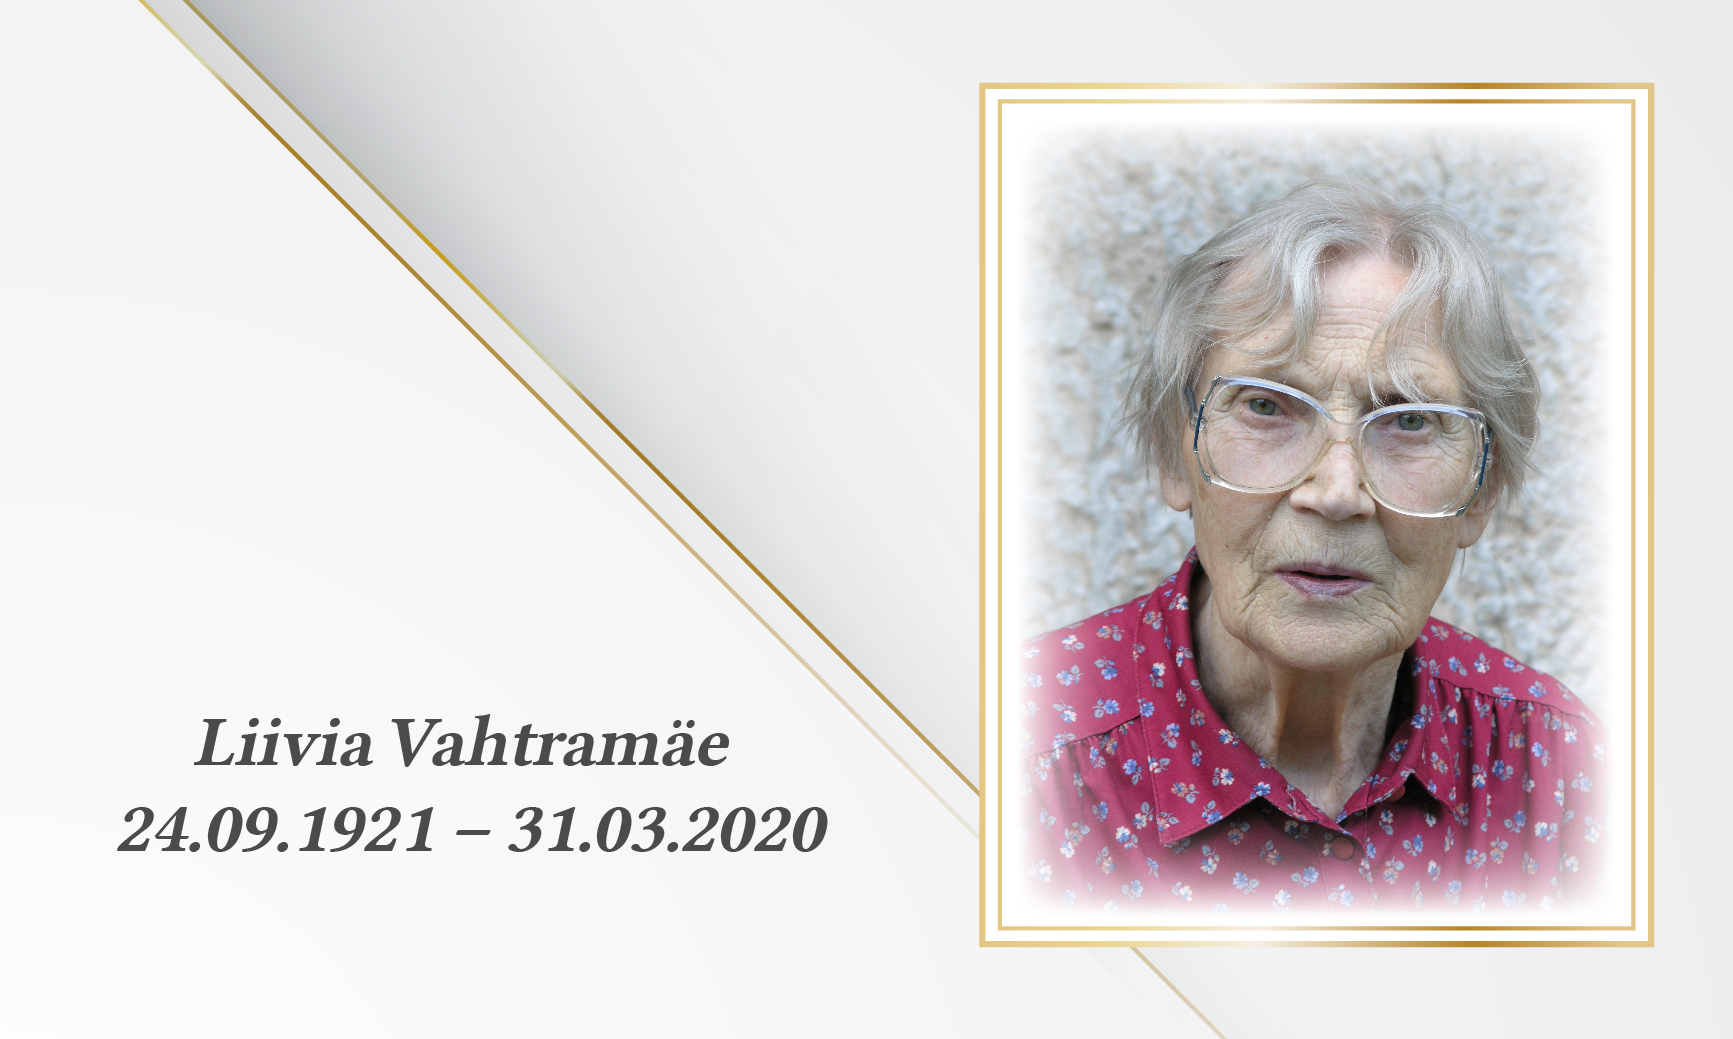 In memoriam Liivia Vahtramäe